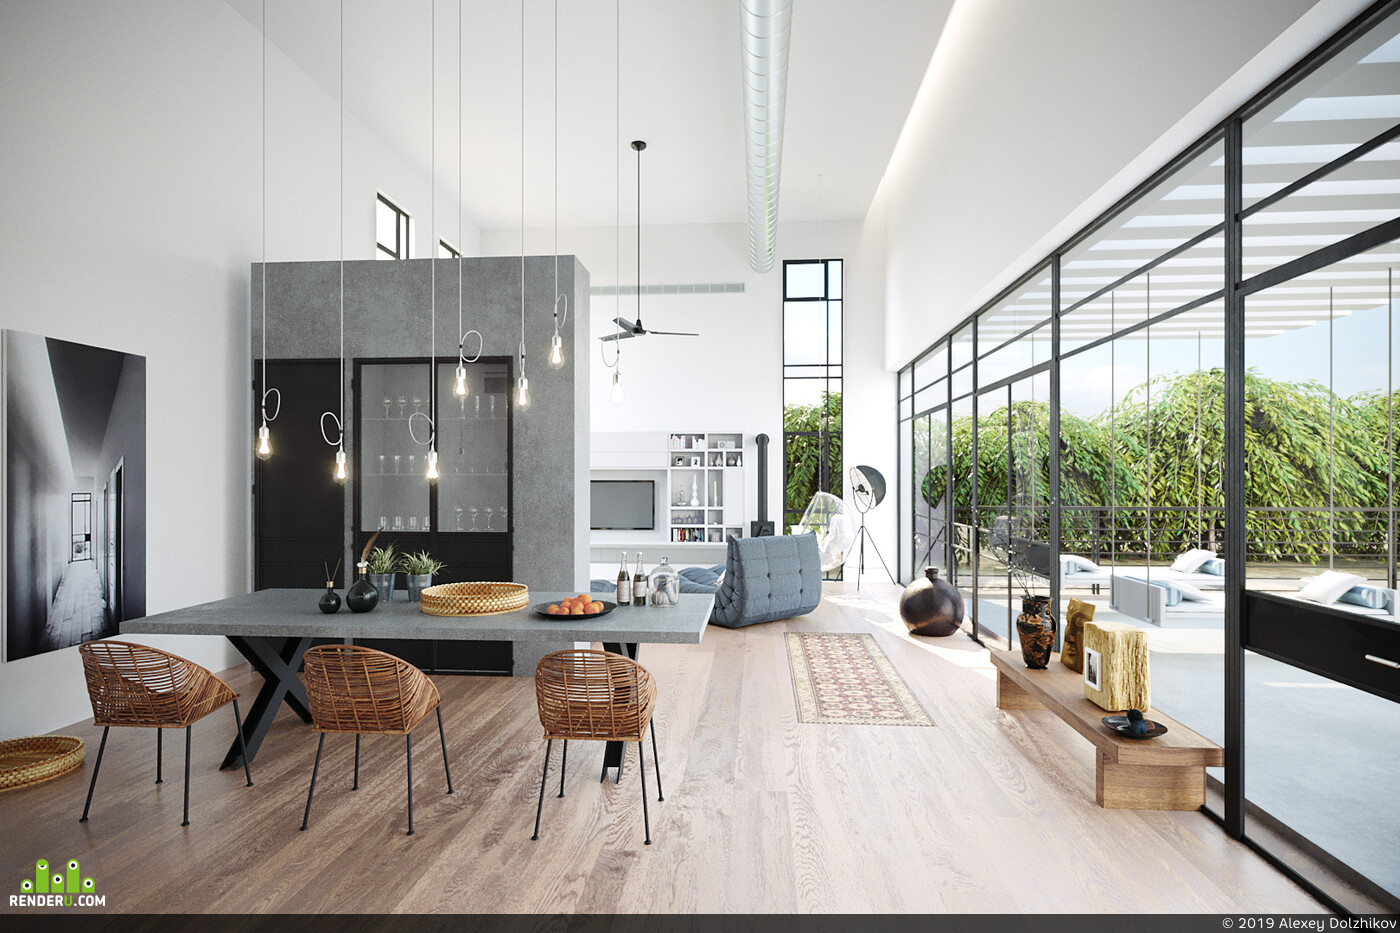 interior, Interior visualization, RENDER 3D VISUALIZATION, 3ds max, Corona Renderer